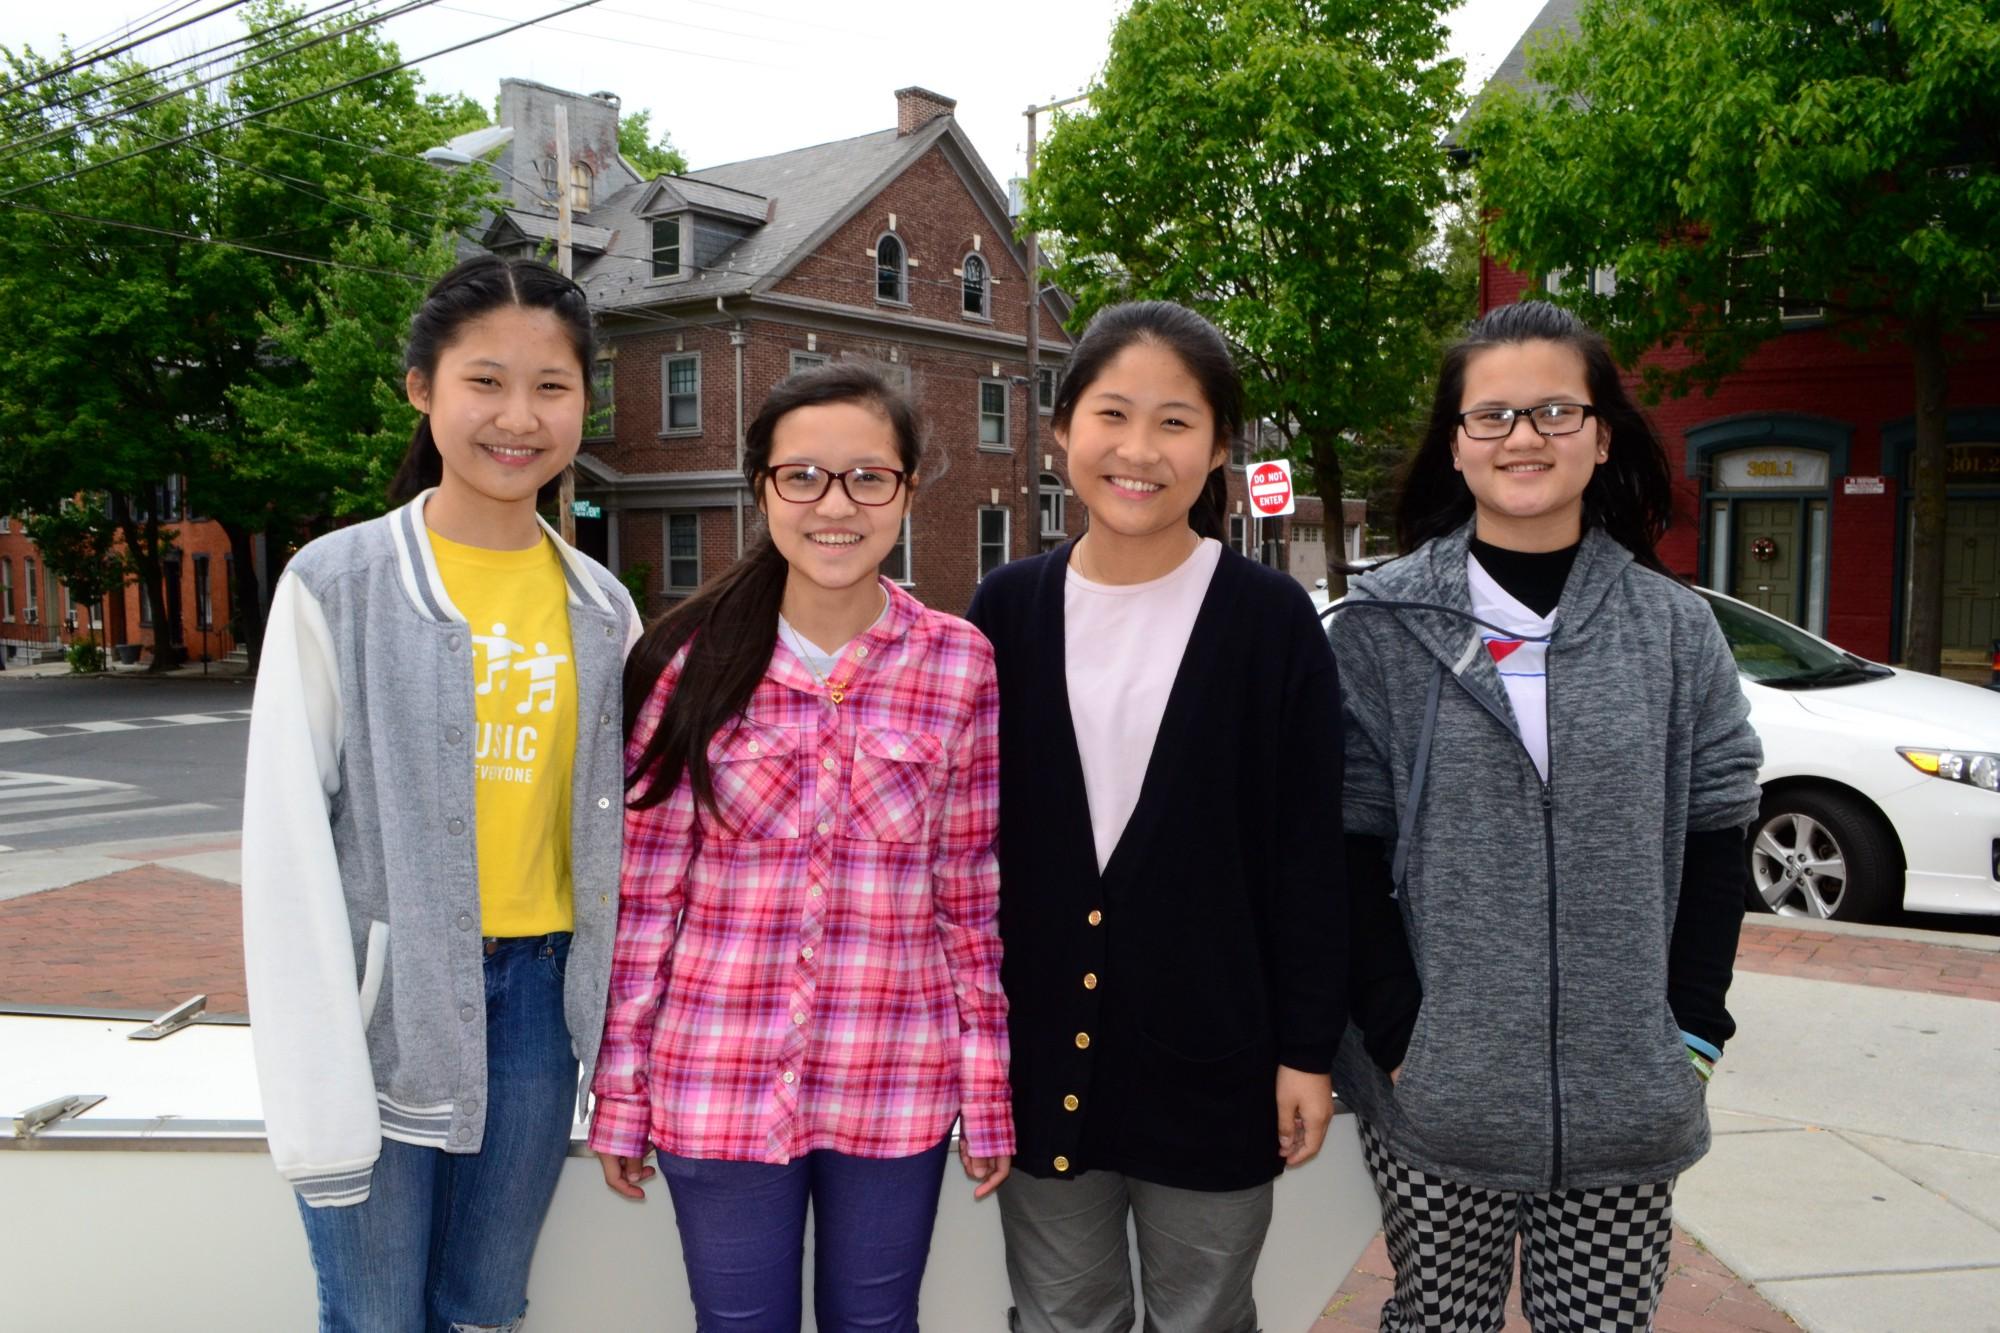 Mimi, Ler, Pree Pree and Hsa Kpru in Lancaster, Pennsylvania. (Courtesy of Tess Thomas / Malala Fund)